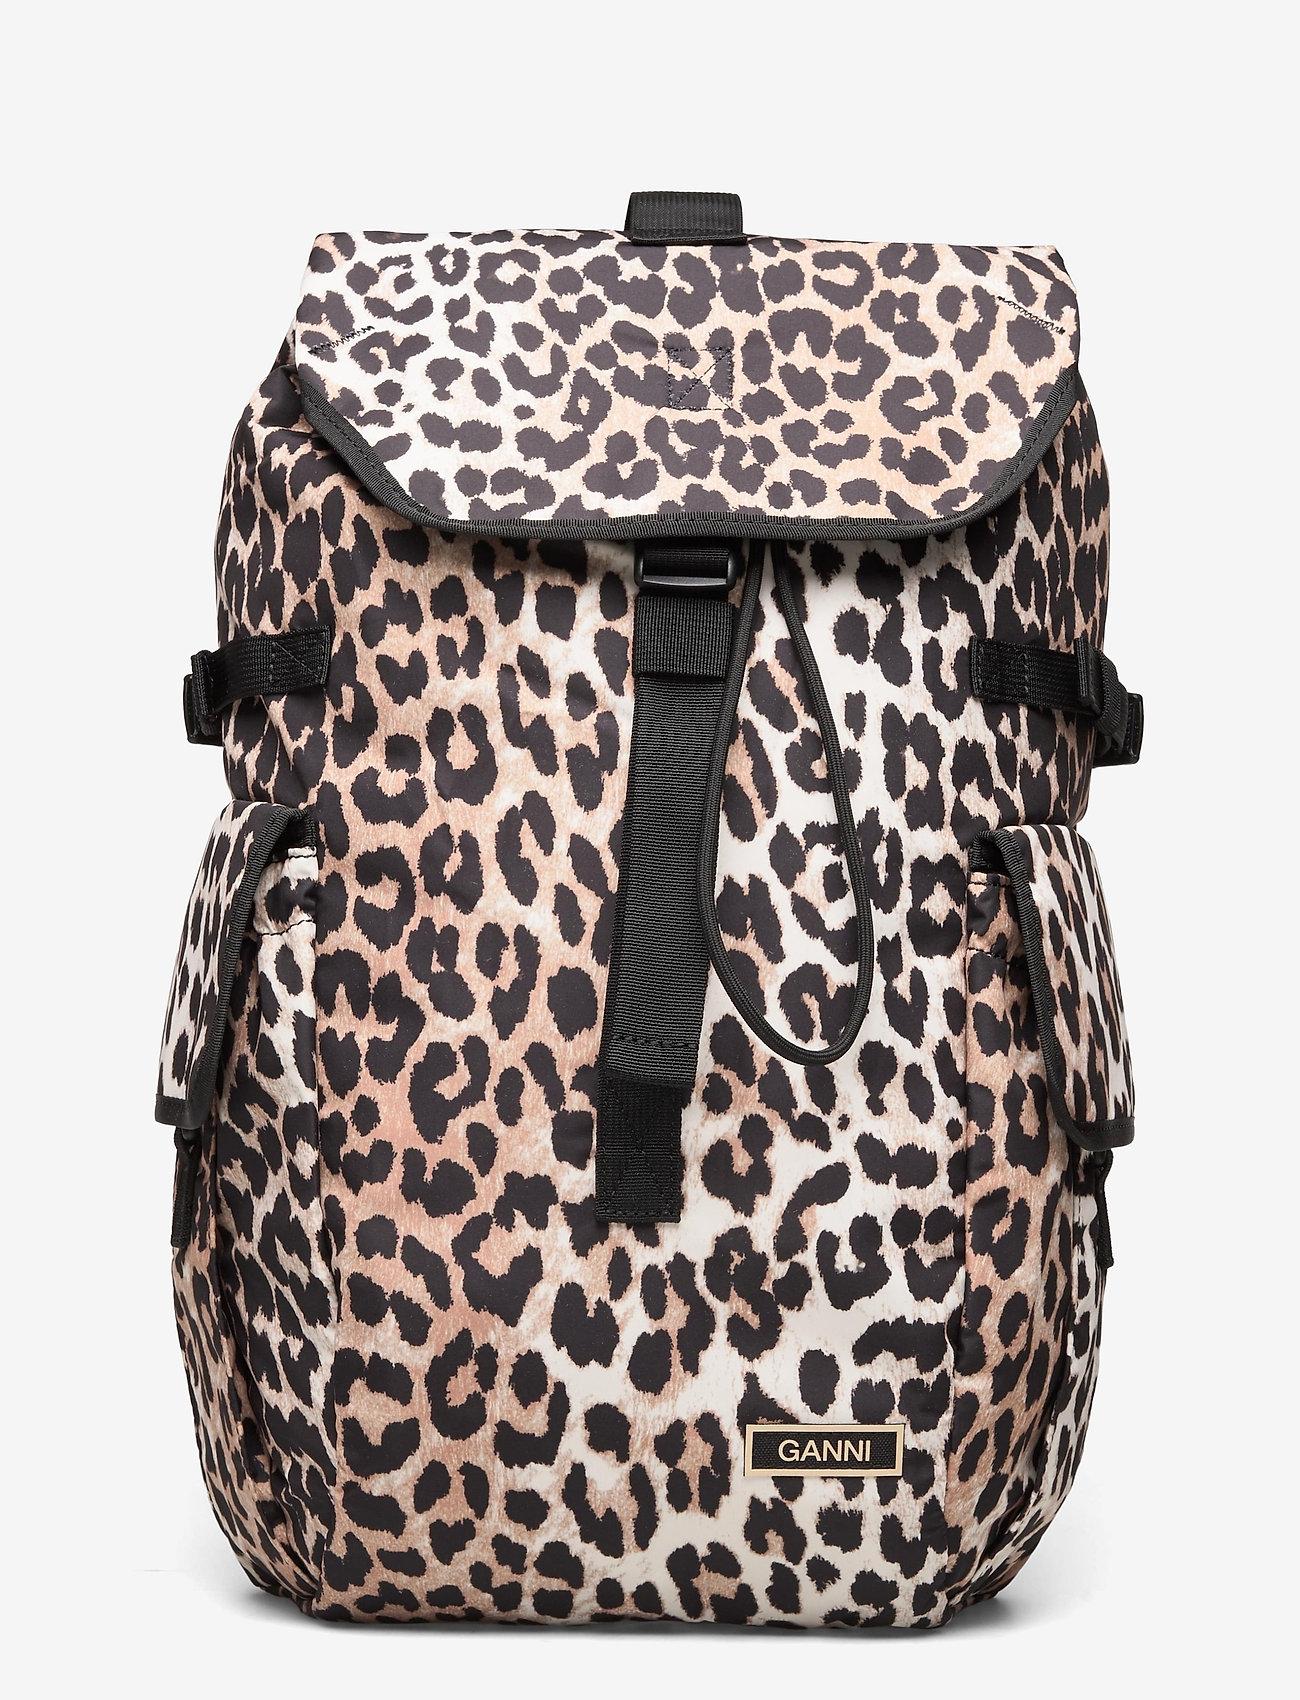 Ganni - Recycled Tech Fabric Bags - tassen - leopard - 0